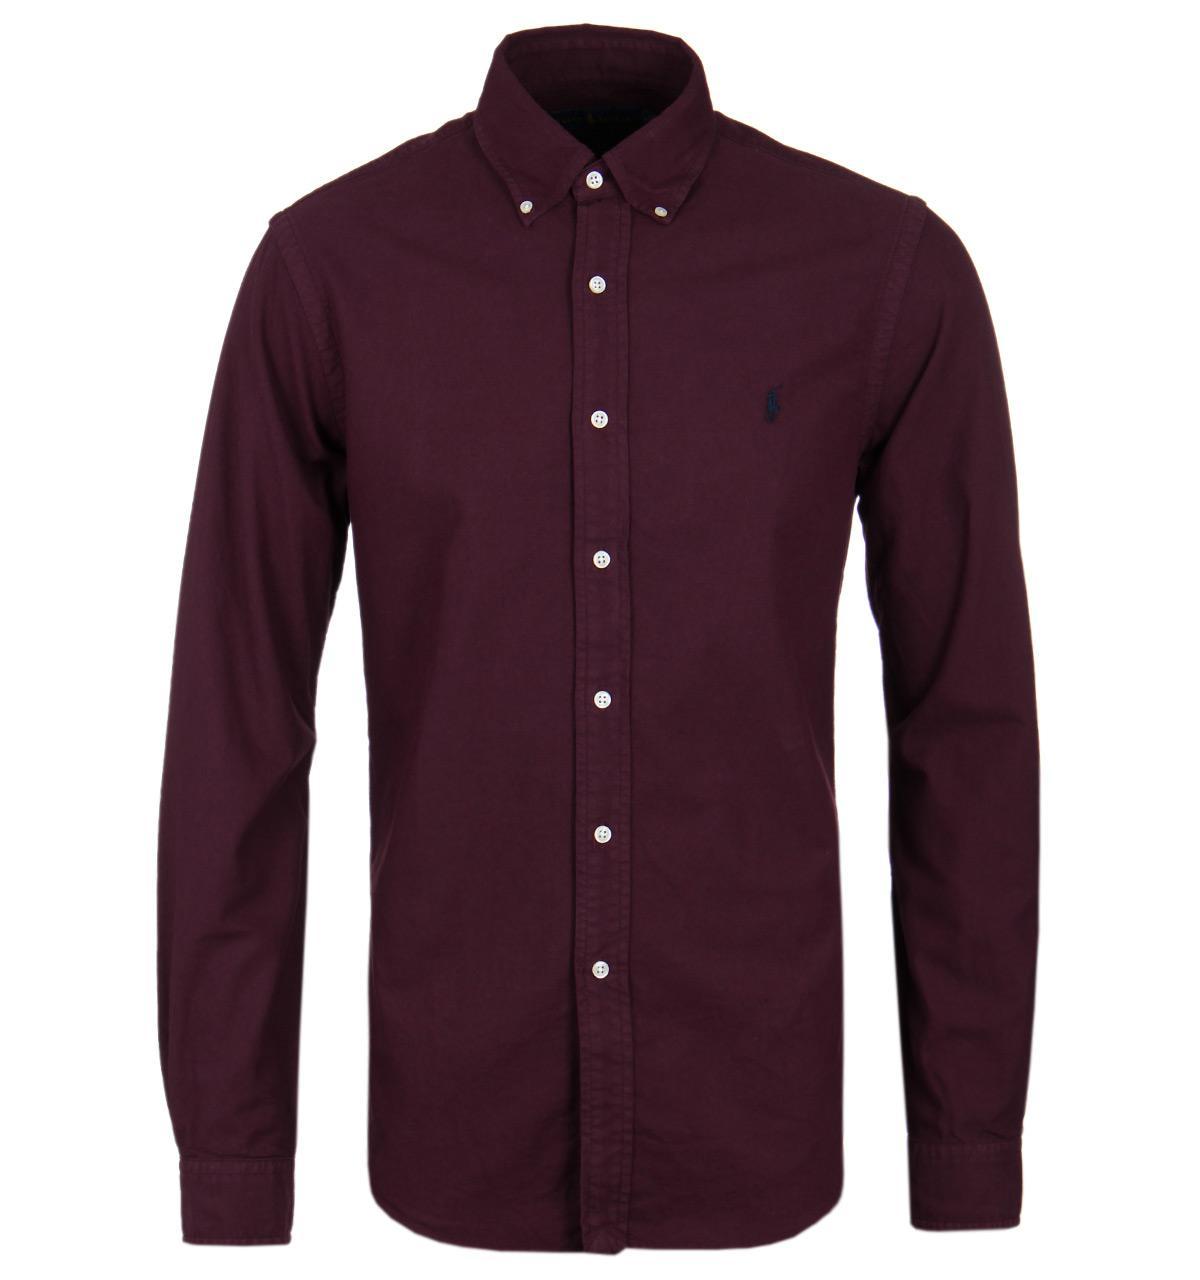 Polo ralph lauren ralph lauren burgundy long sleeve oxford for Long sleeve purple polo shirt